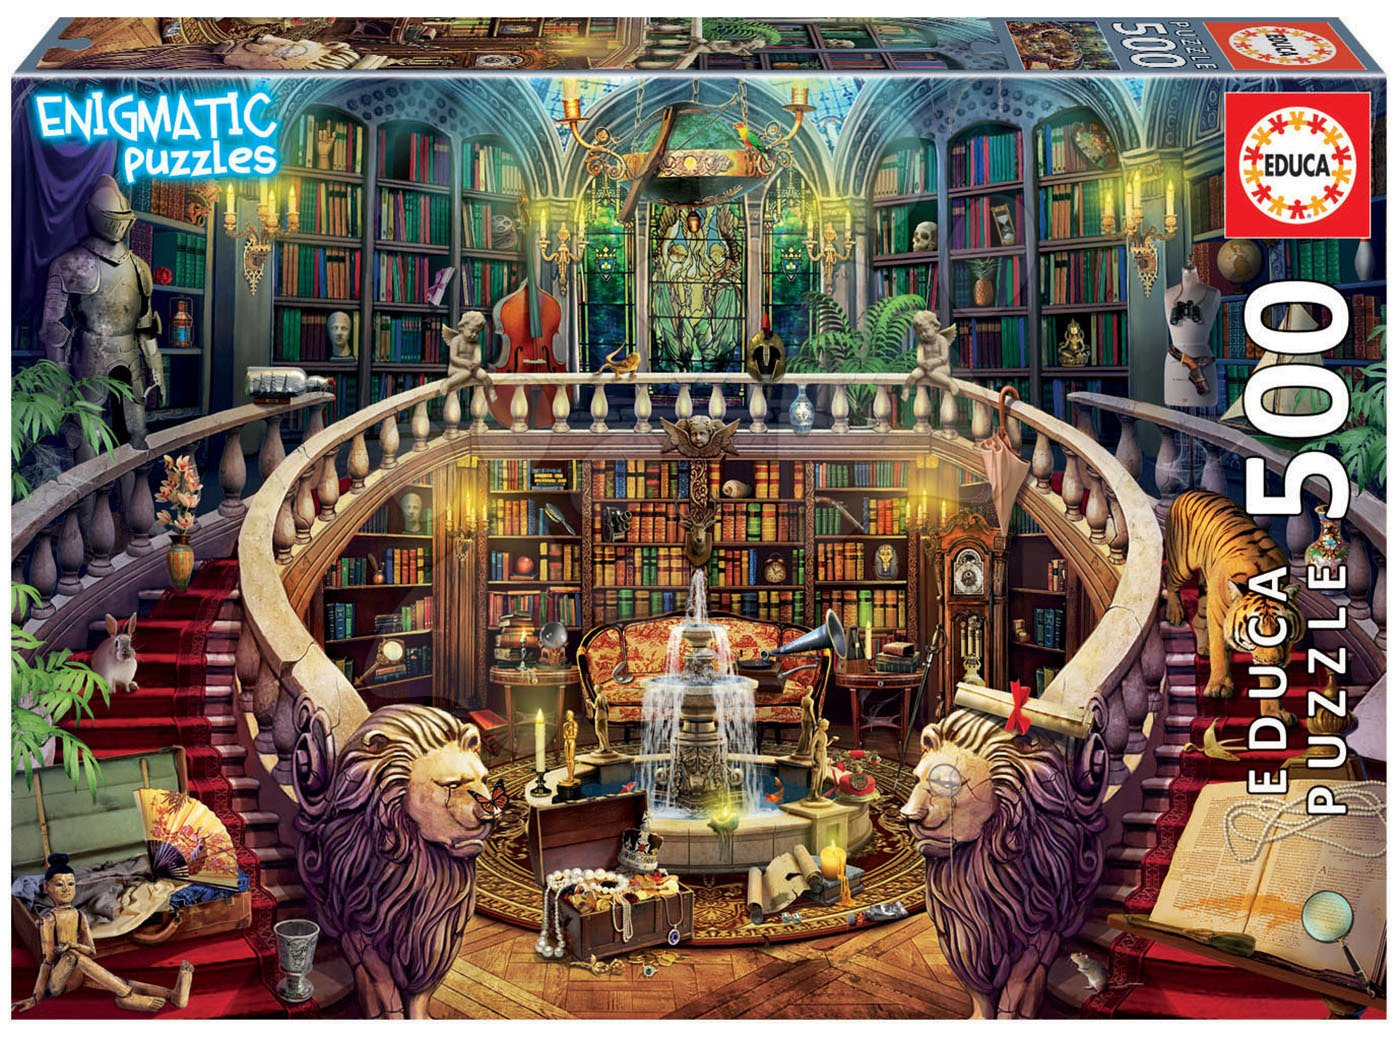 Puzzle Old Library Mysterious Educa 500 dílků a Fix lepidlo od 11 let